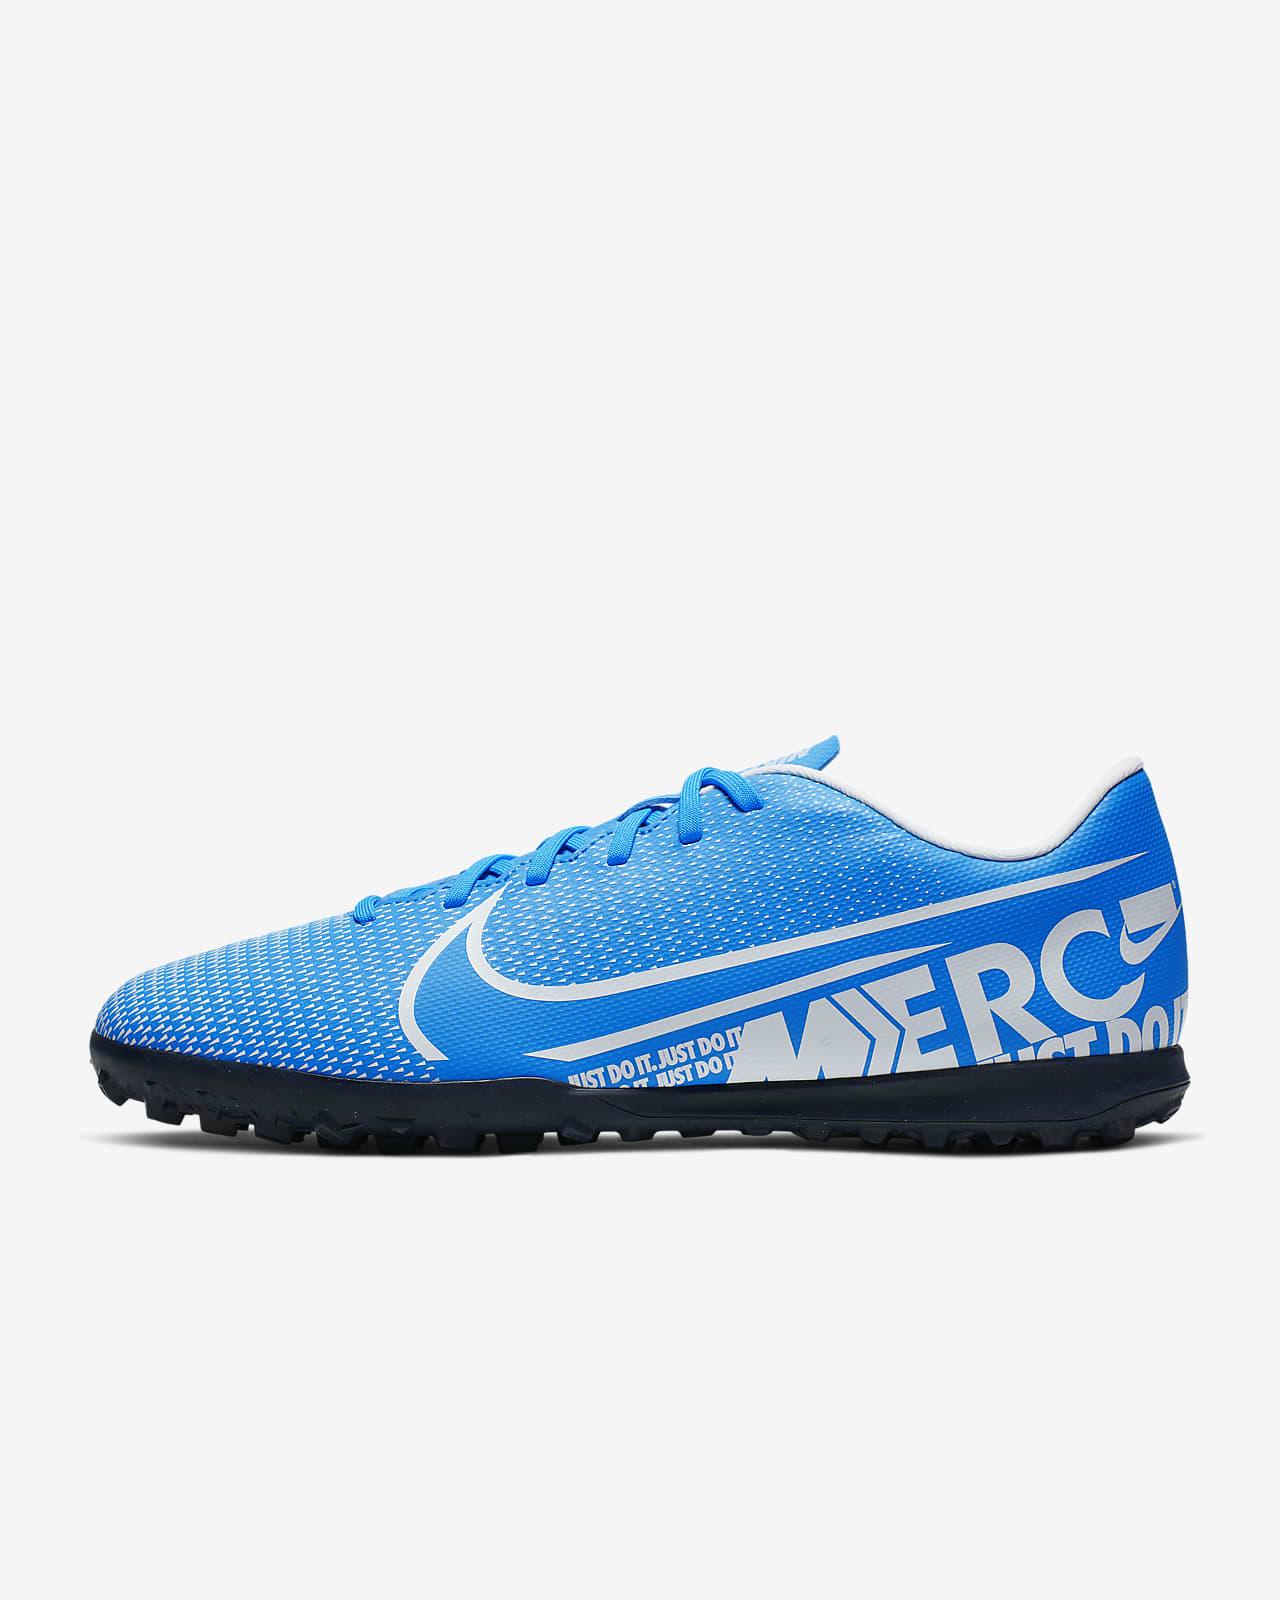 Nike Mercurial Vapor 13 Club TF Artificial-Turf Football Shoe